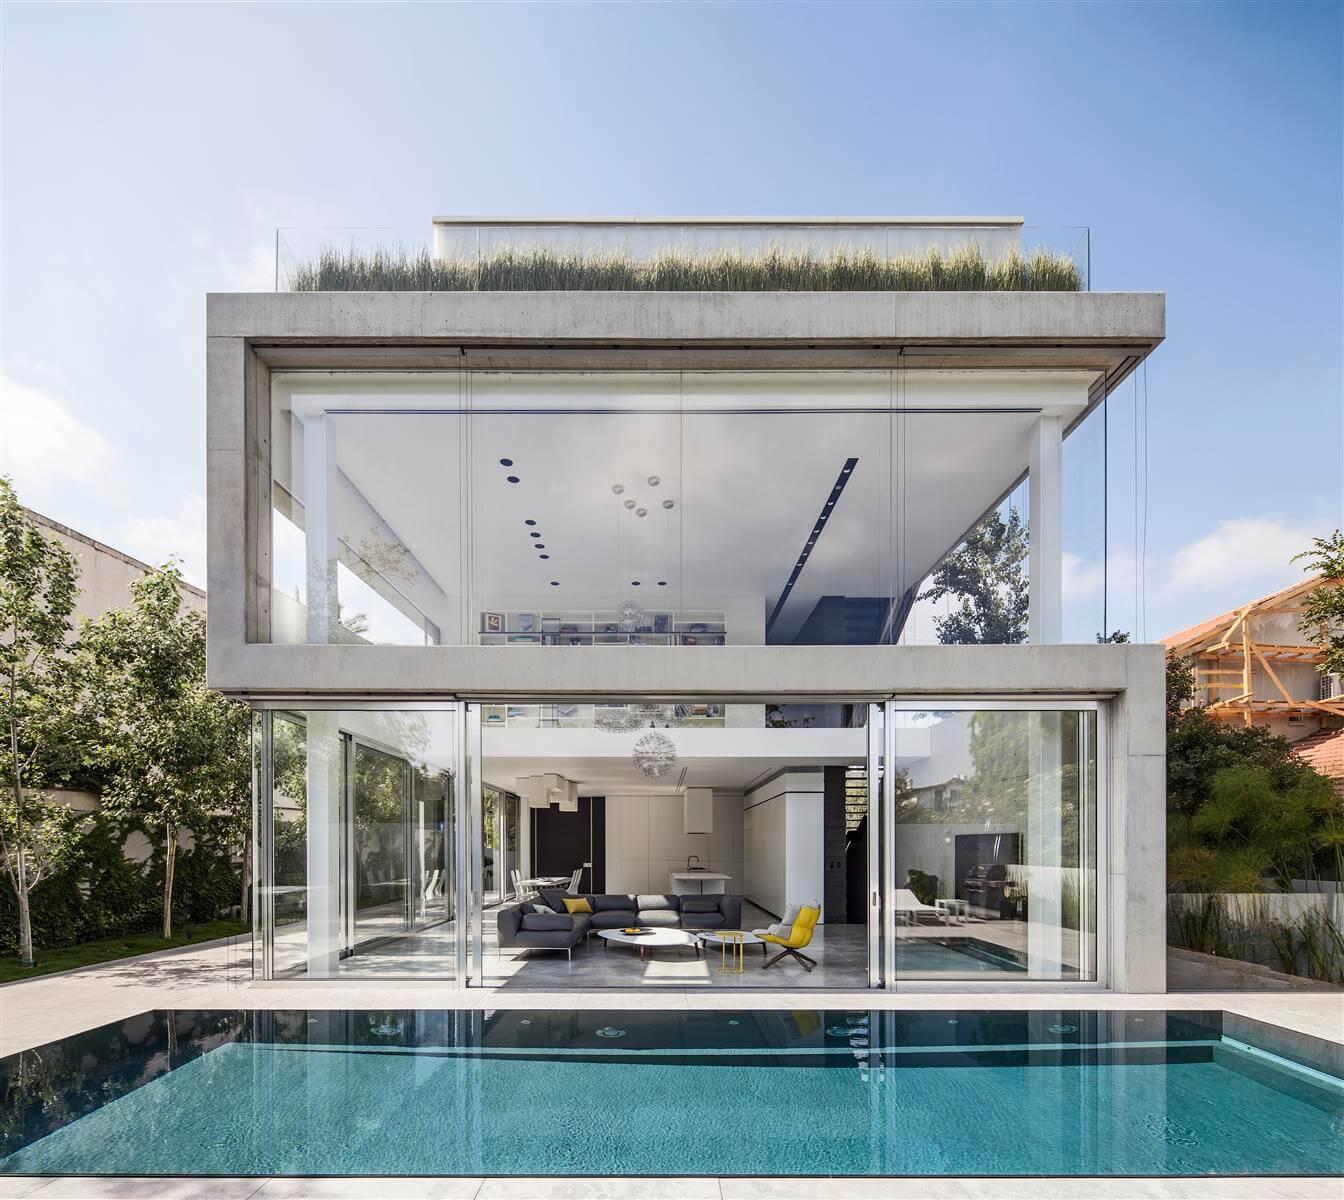 The Concrete Cut House in Ramat Gan by Pitsou Kedem Architects-23